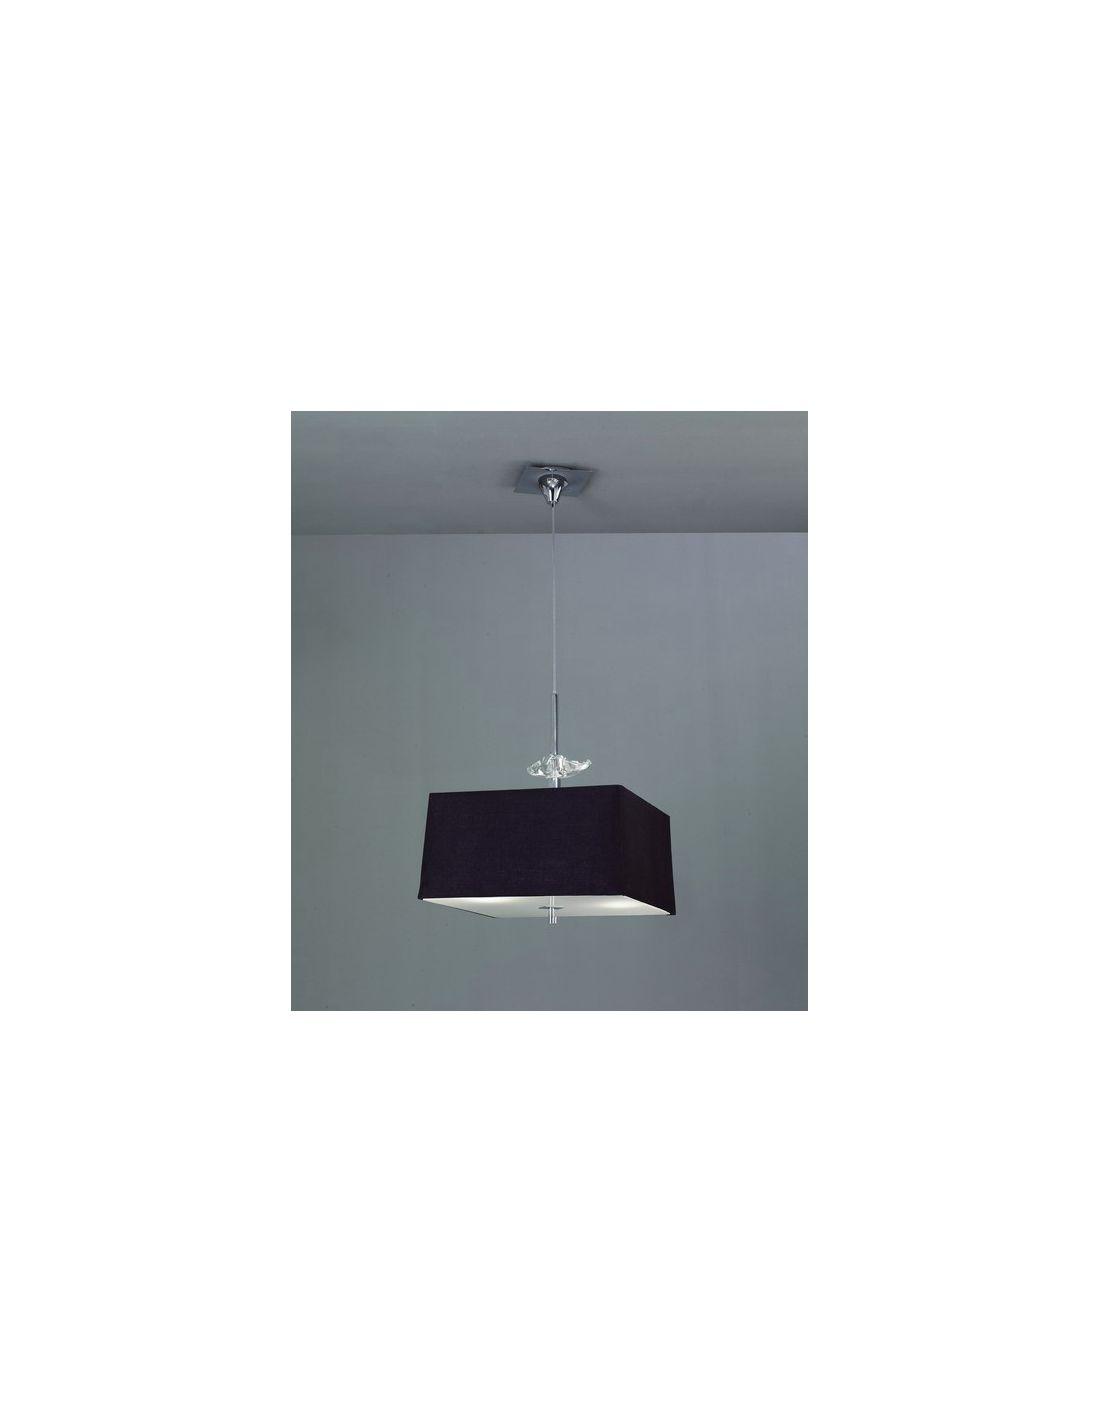 Lamparas lamparas modernas lamparas de techo modernas - Lamparas de techo baratas ...